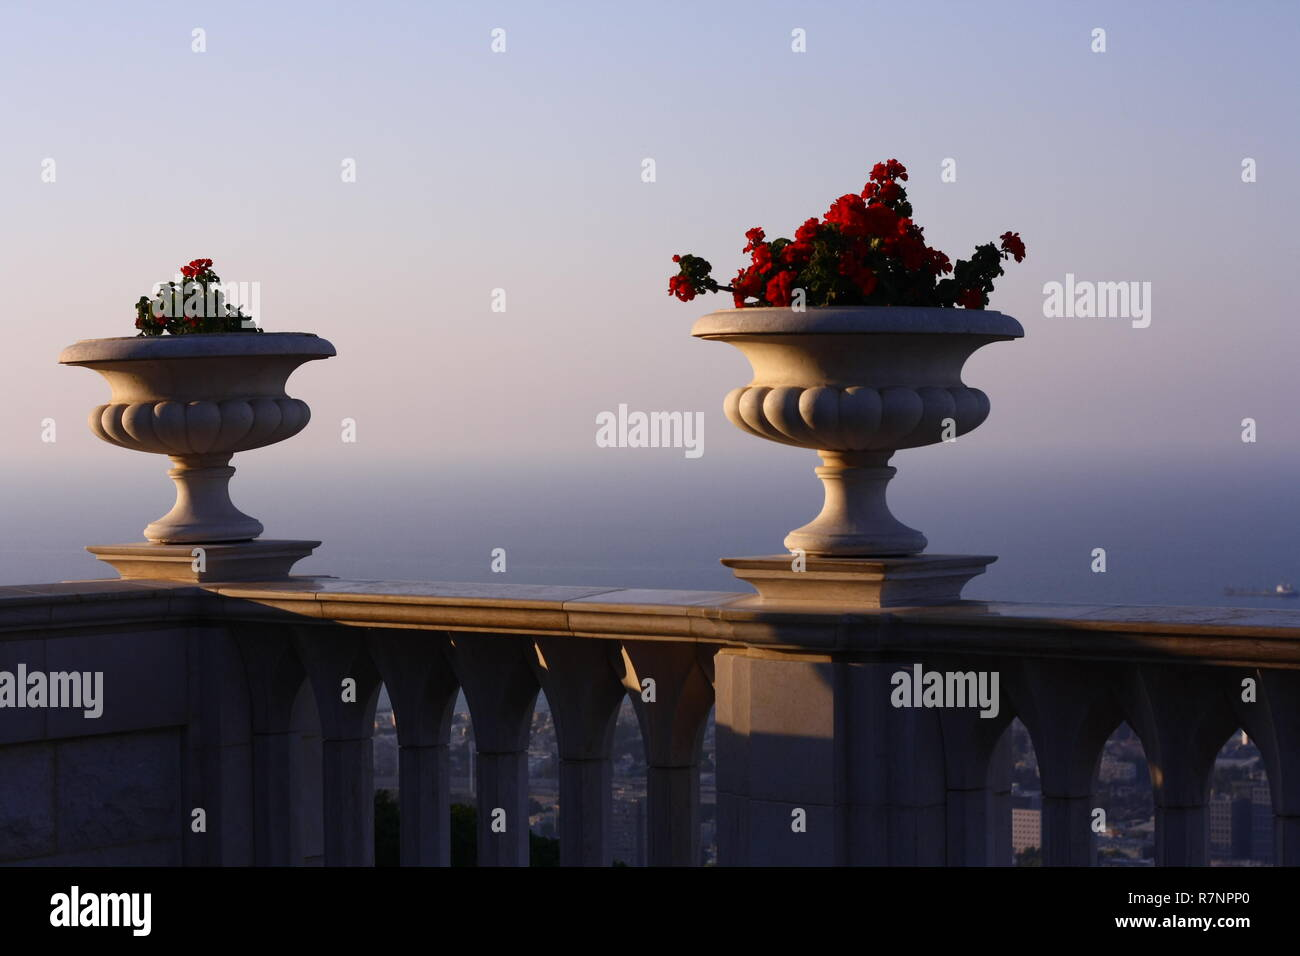 Flowerbeds, Hayfa - Stock Image